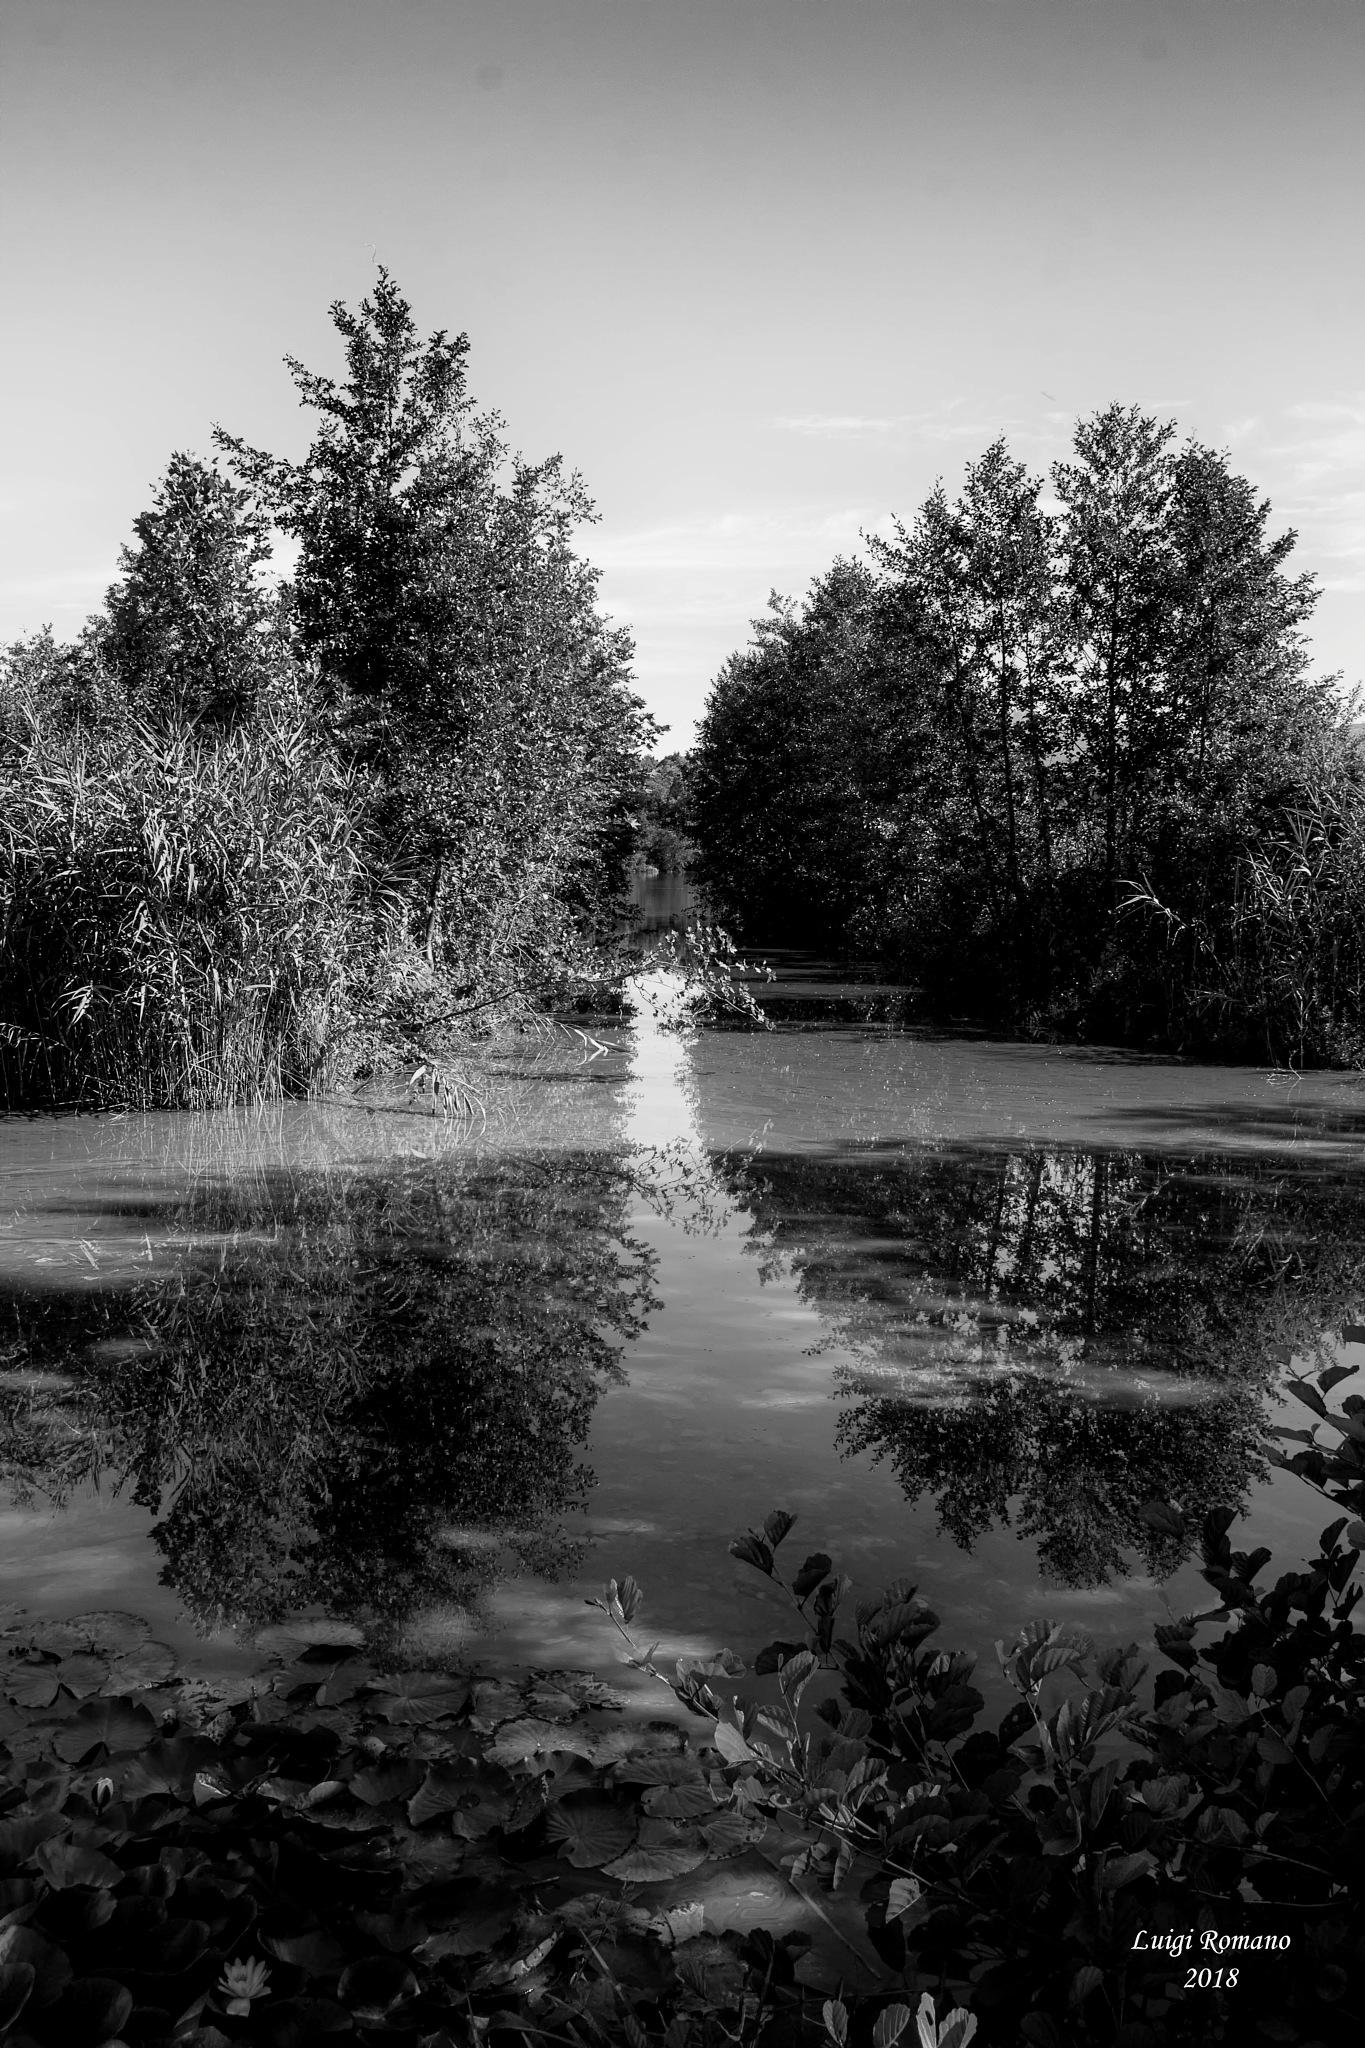 Black and white reflections in the Sartirana lake by Luigi Romano